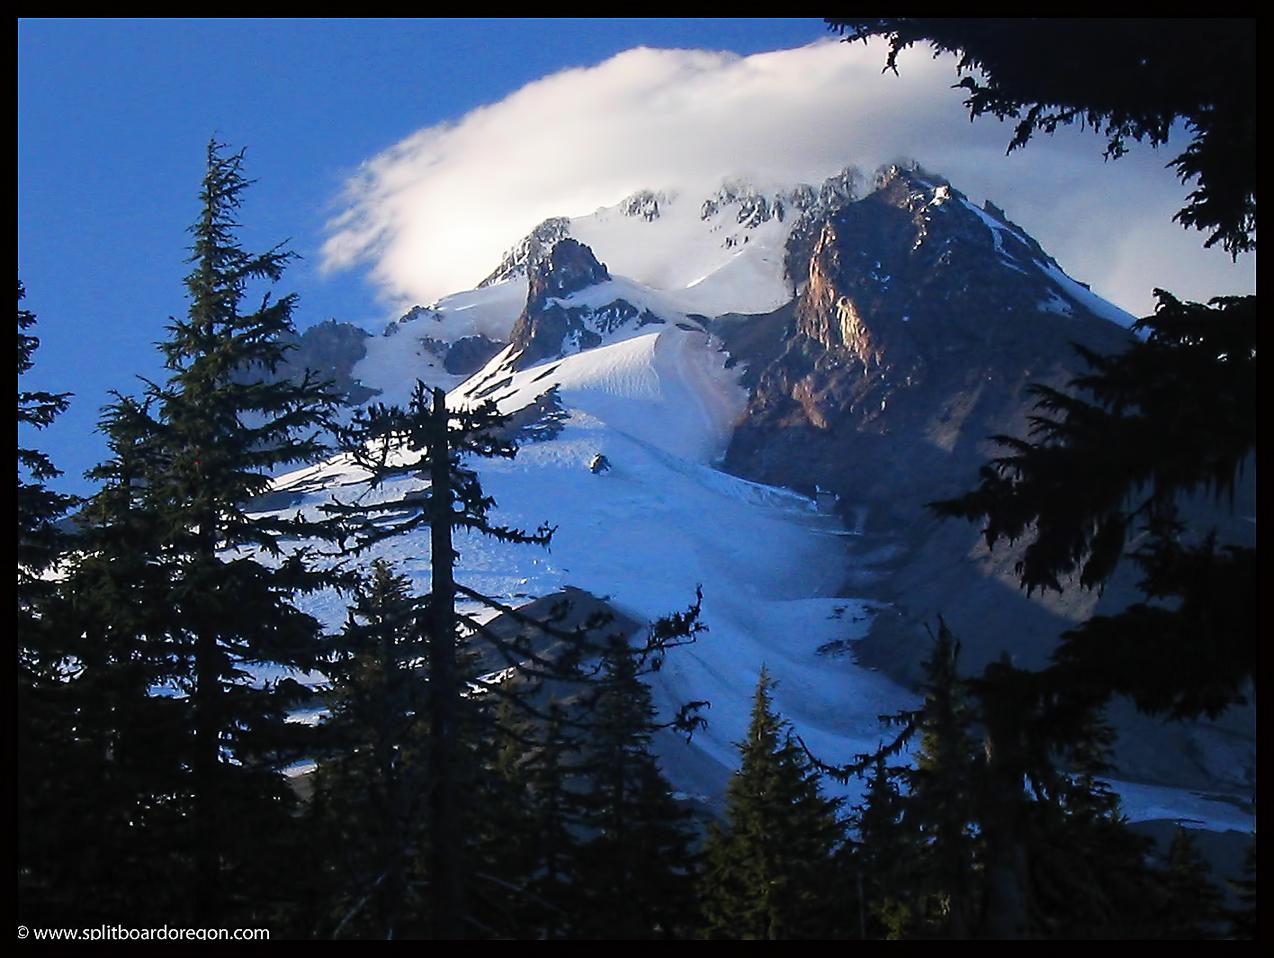 White River Glacier - July 2007 - Photo by Todd Singleton